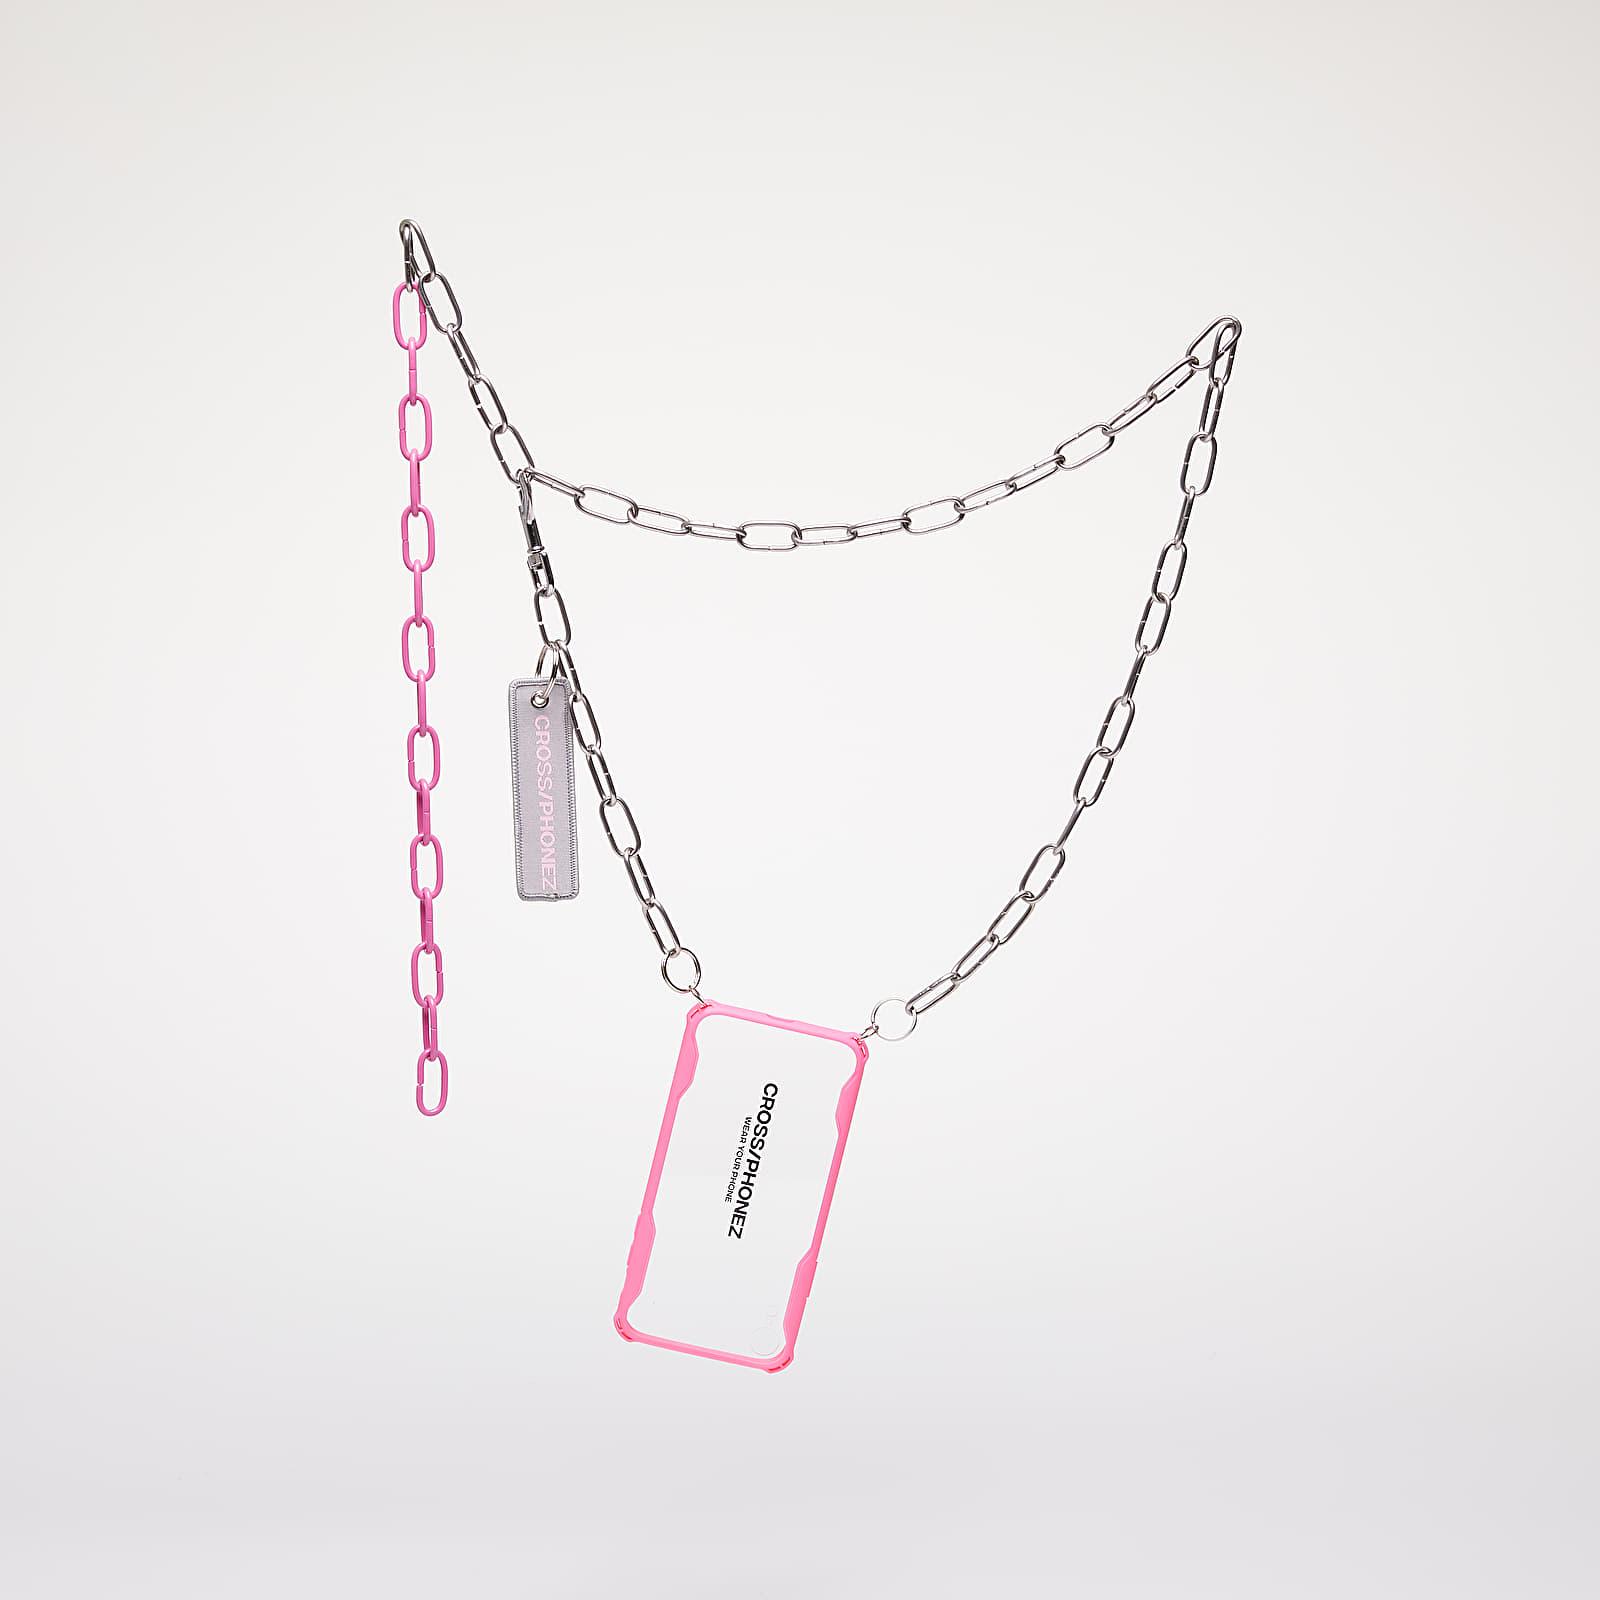 Doplňky Cross/Phonez Chain Case Silver/ Pink